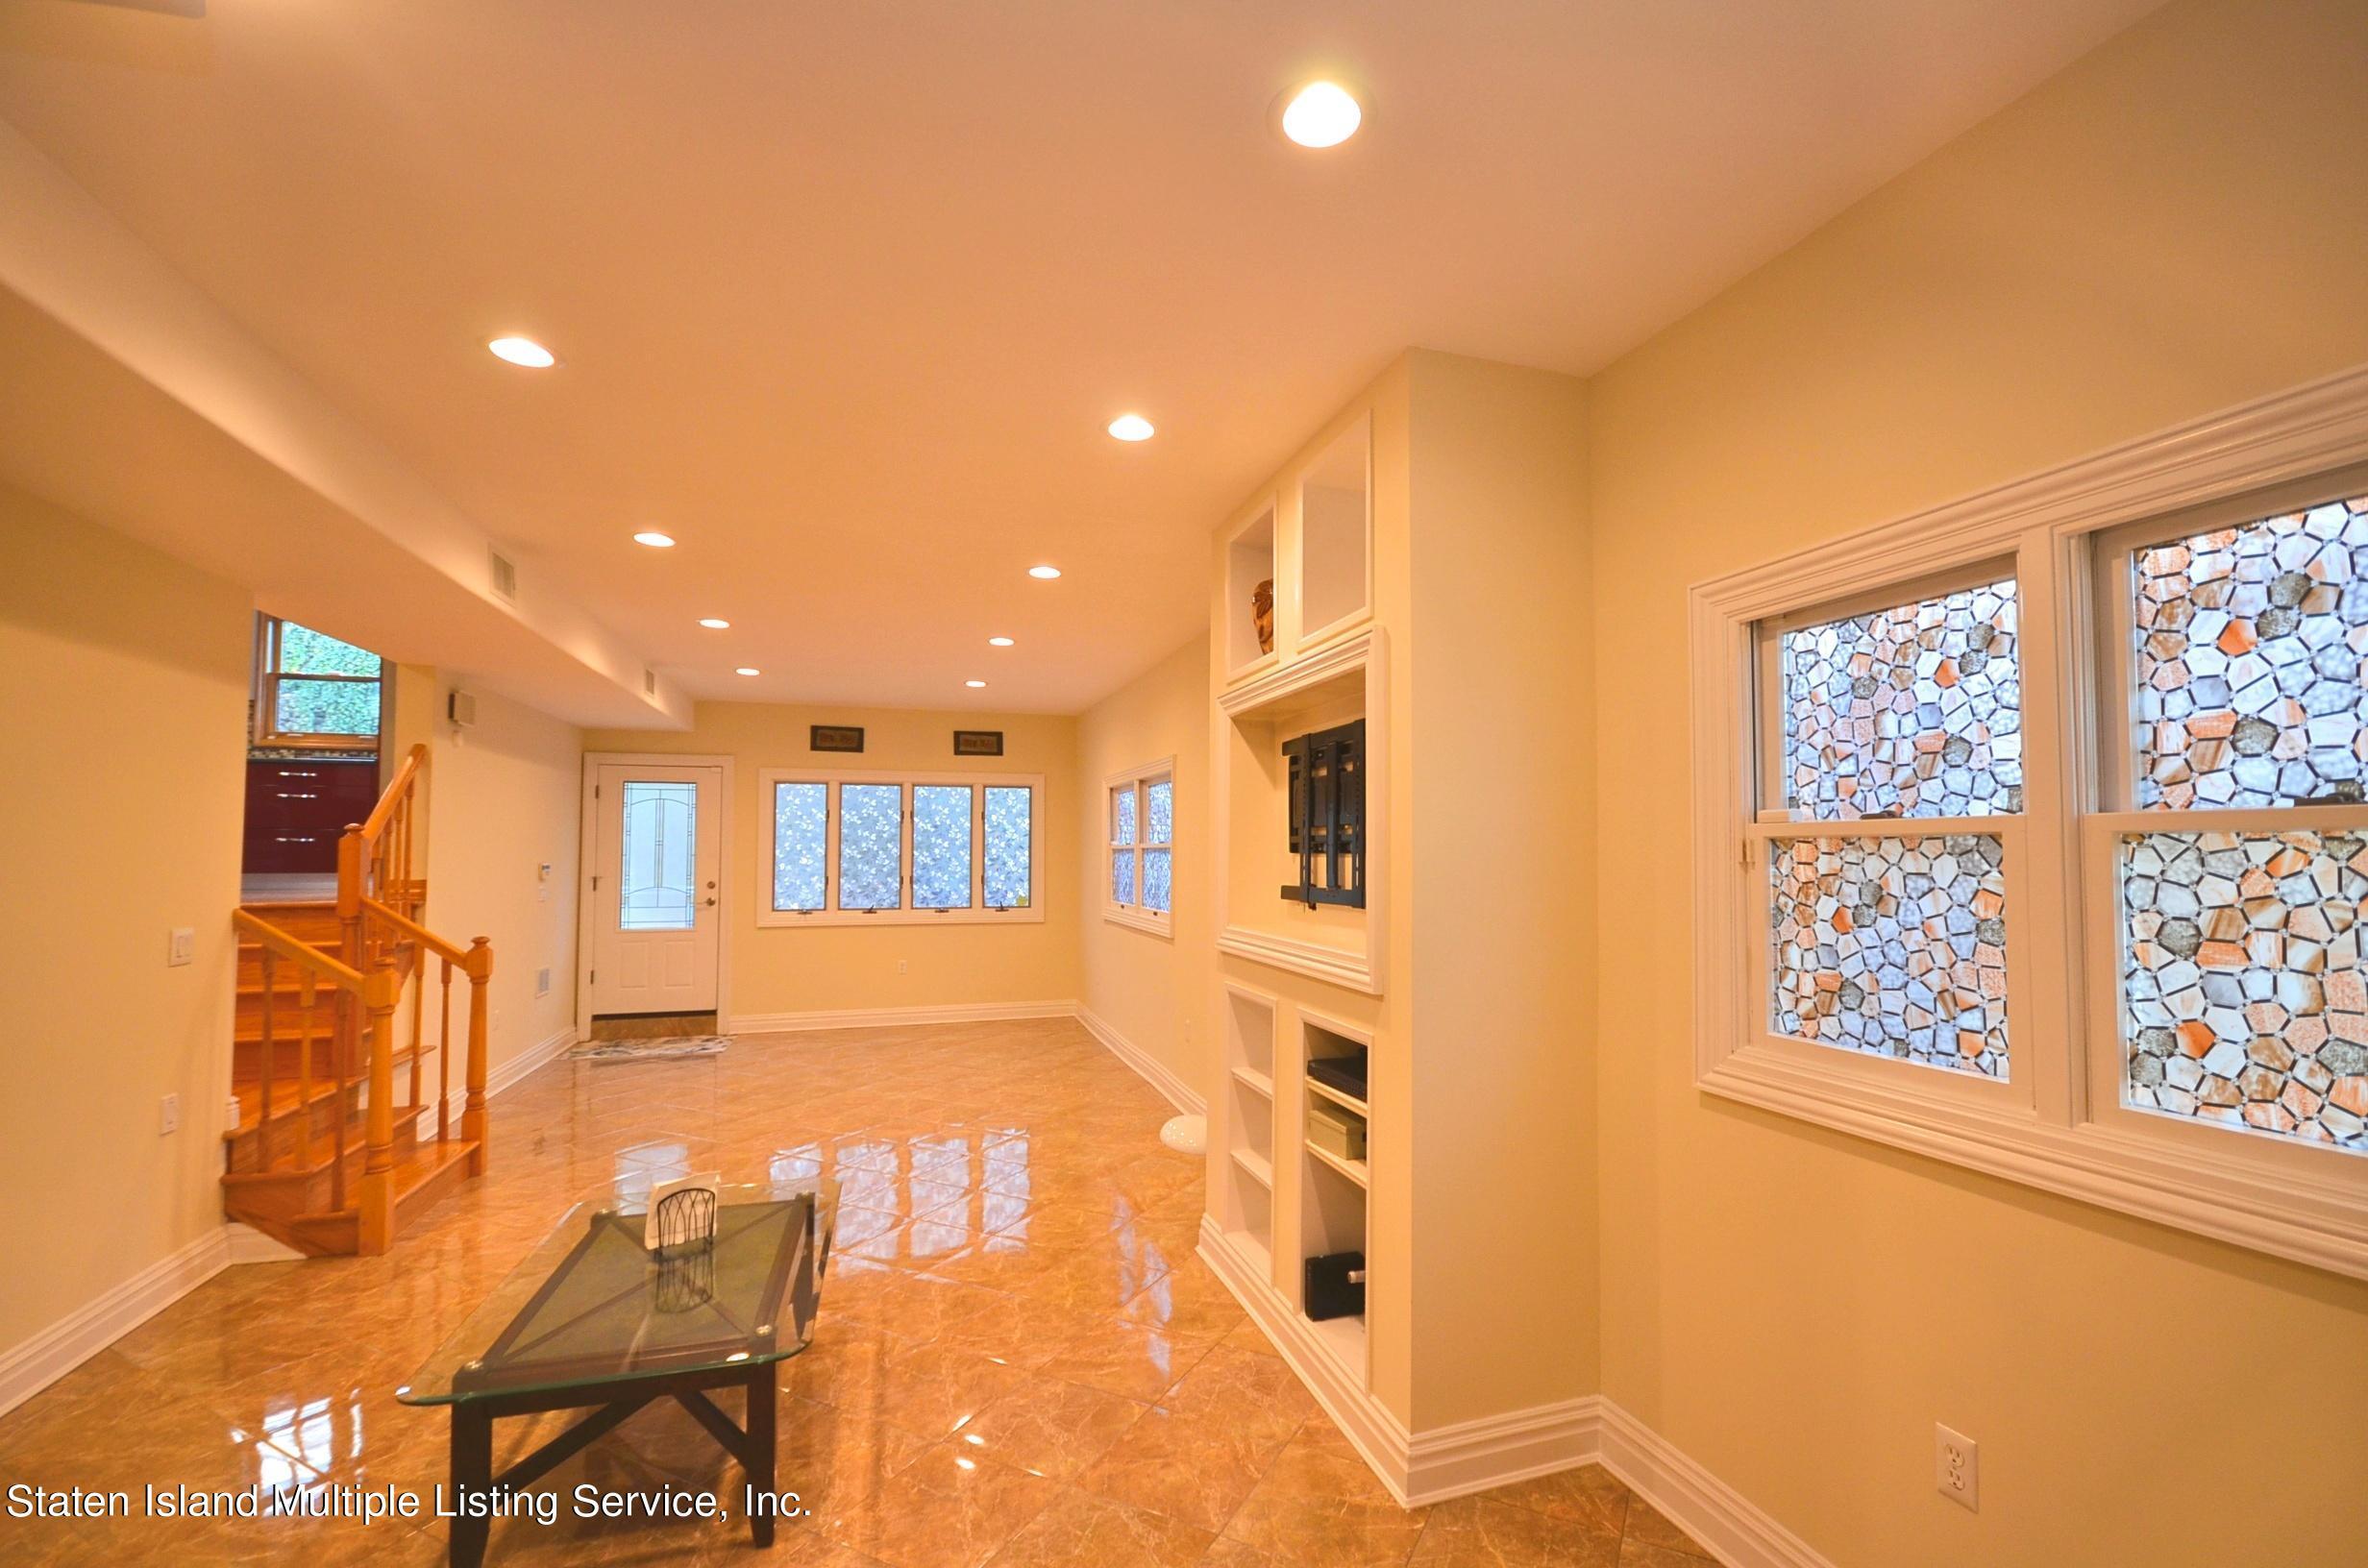 Single Family - Detached 48 Ocean Terrace  Staten Island, NY 10314, MLS-1142240-25